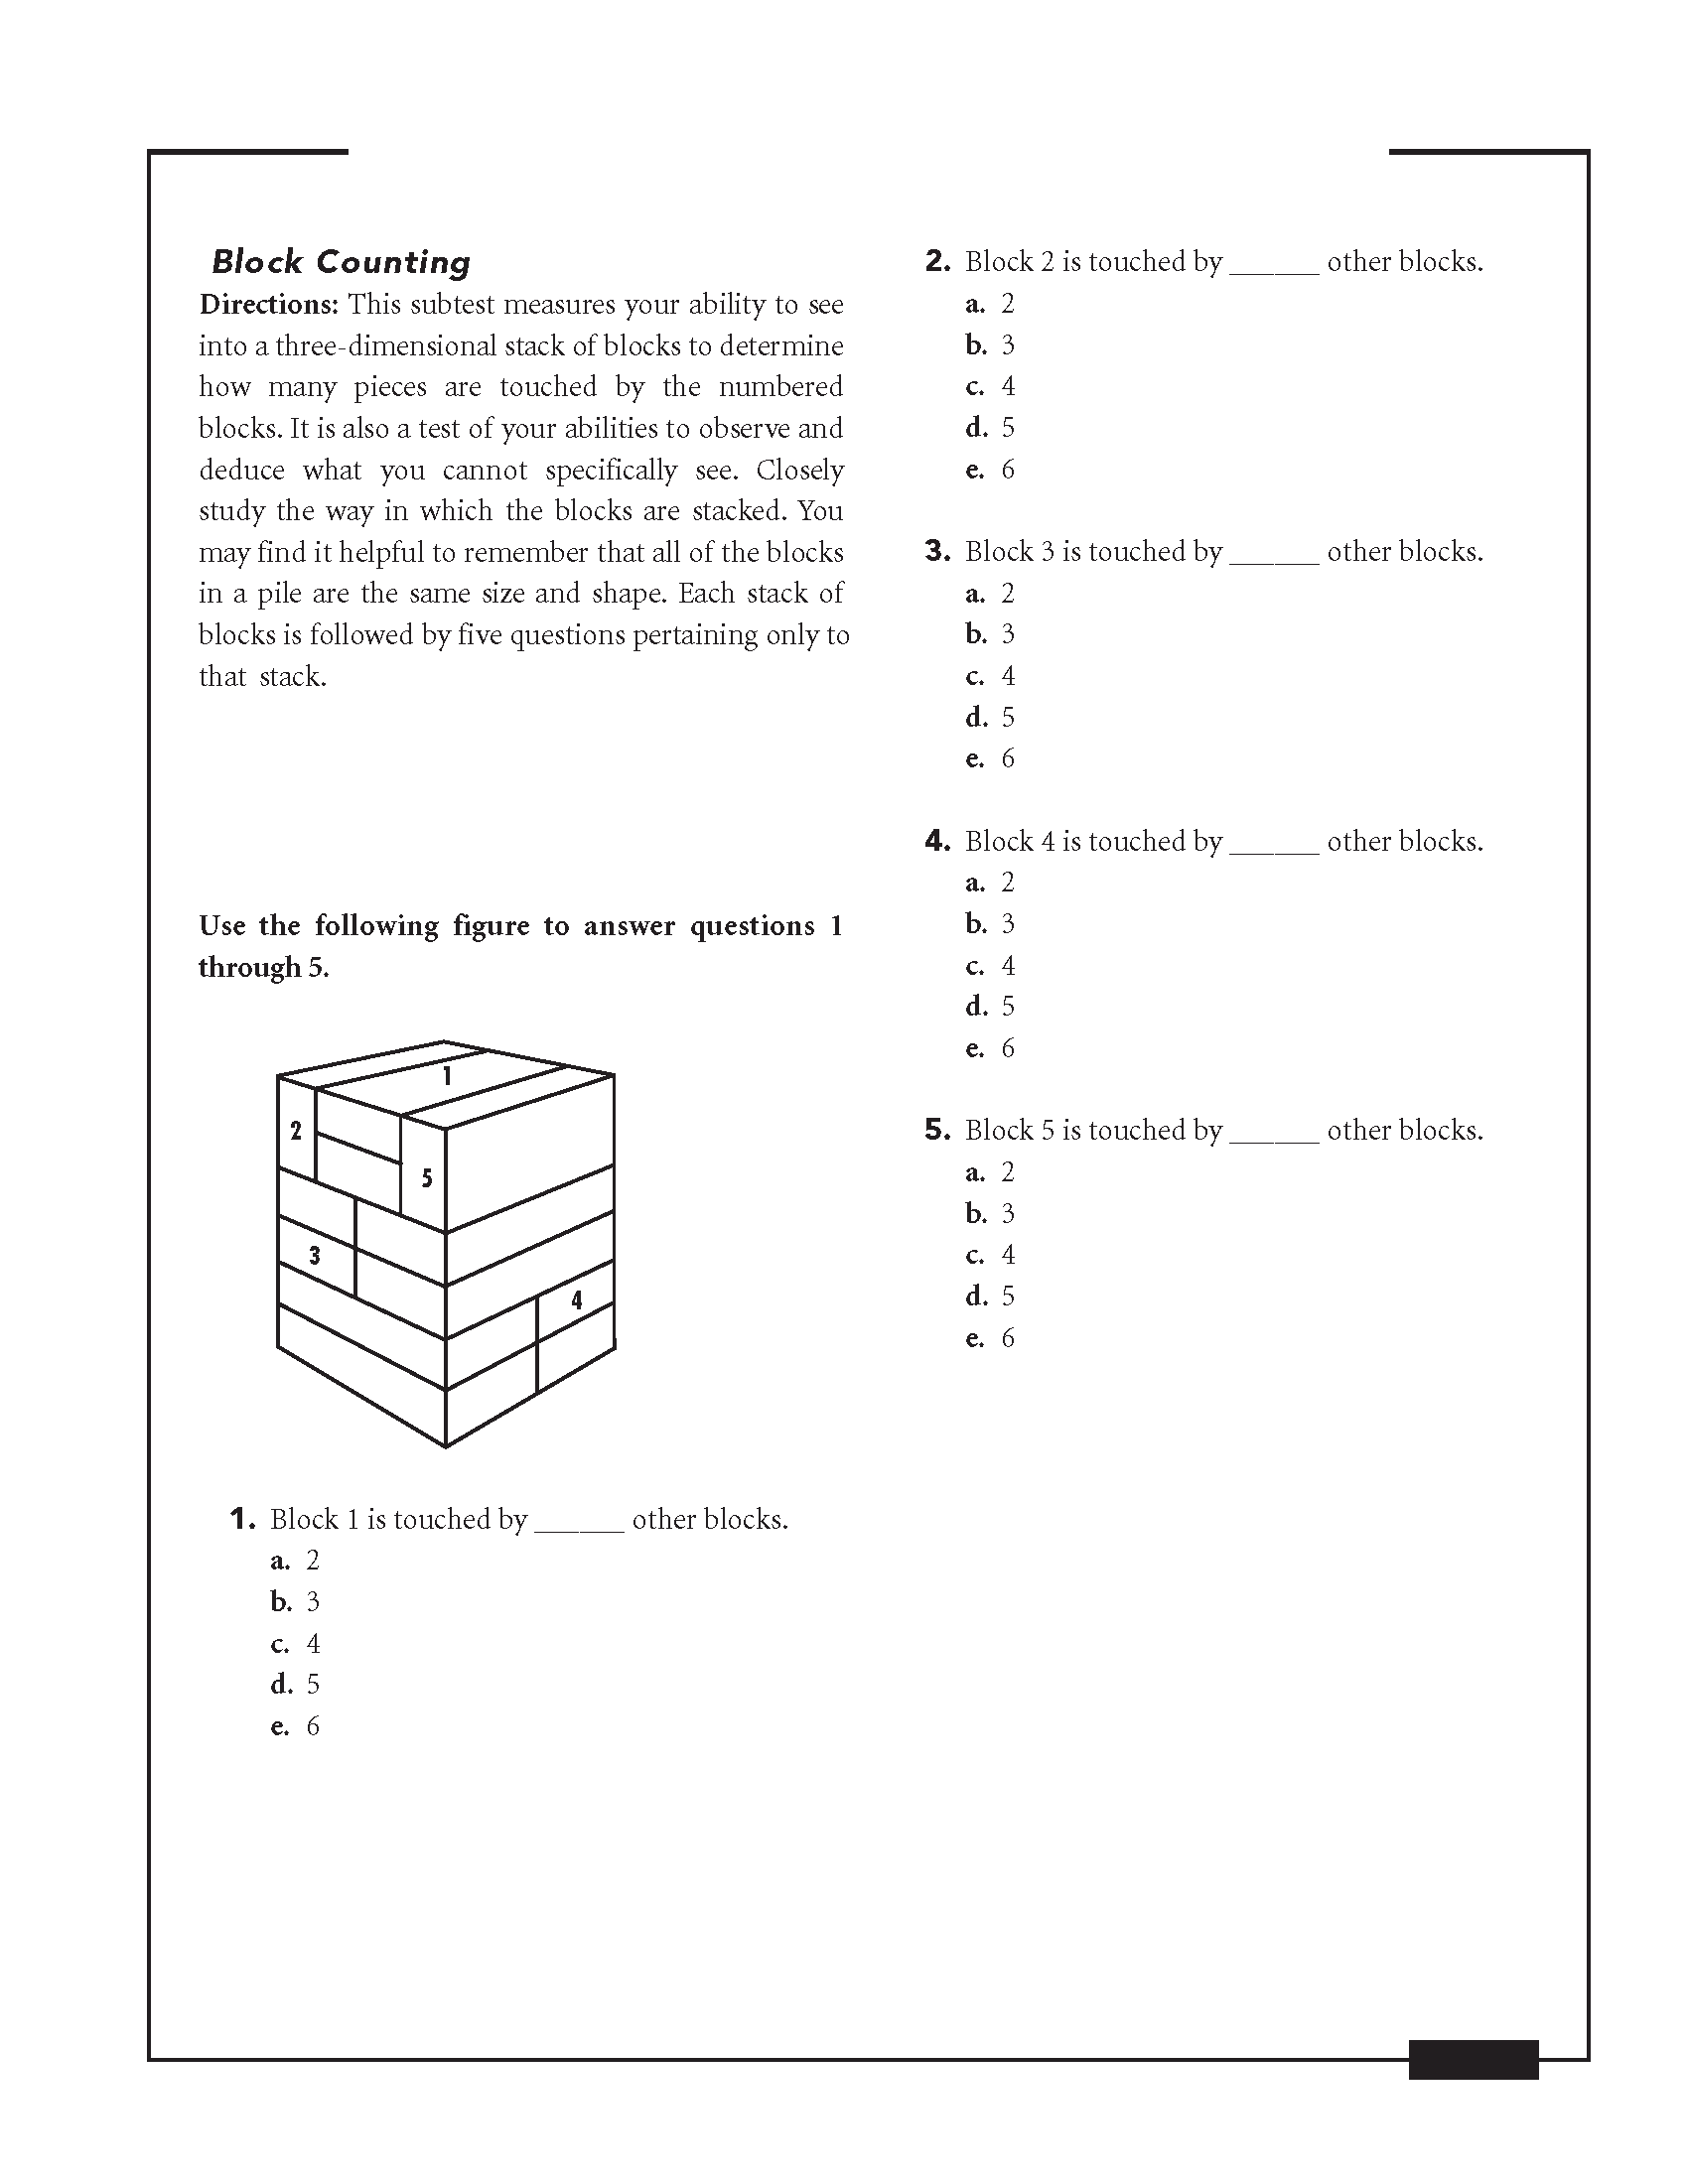 AFOQTGuide.com Block Counting Problems Image 1